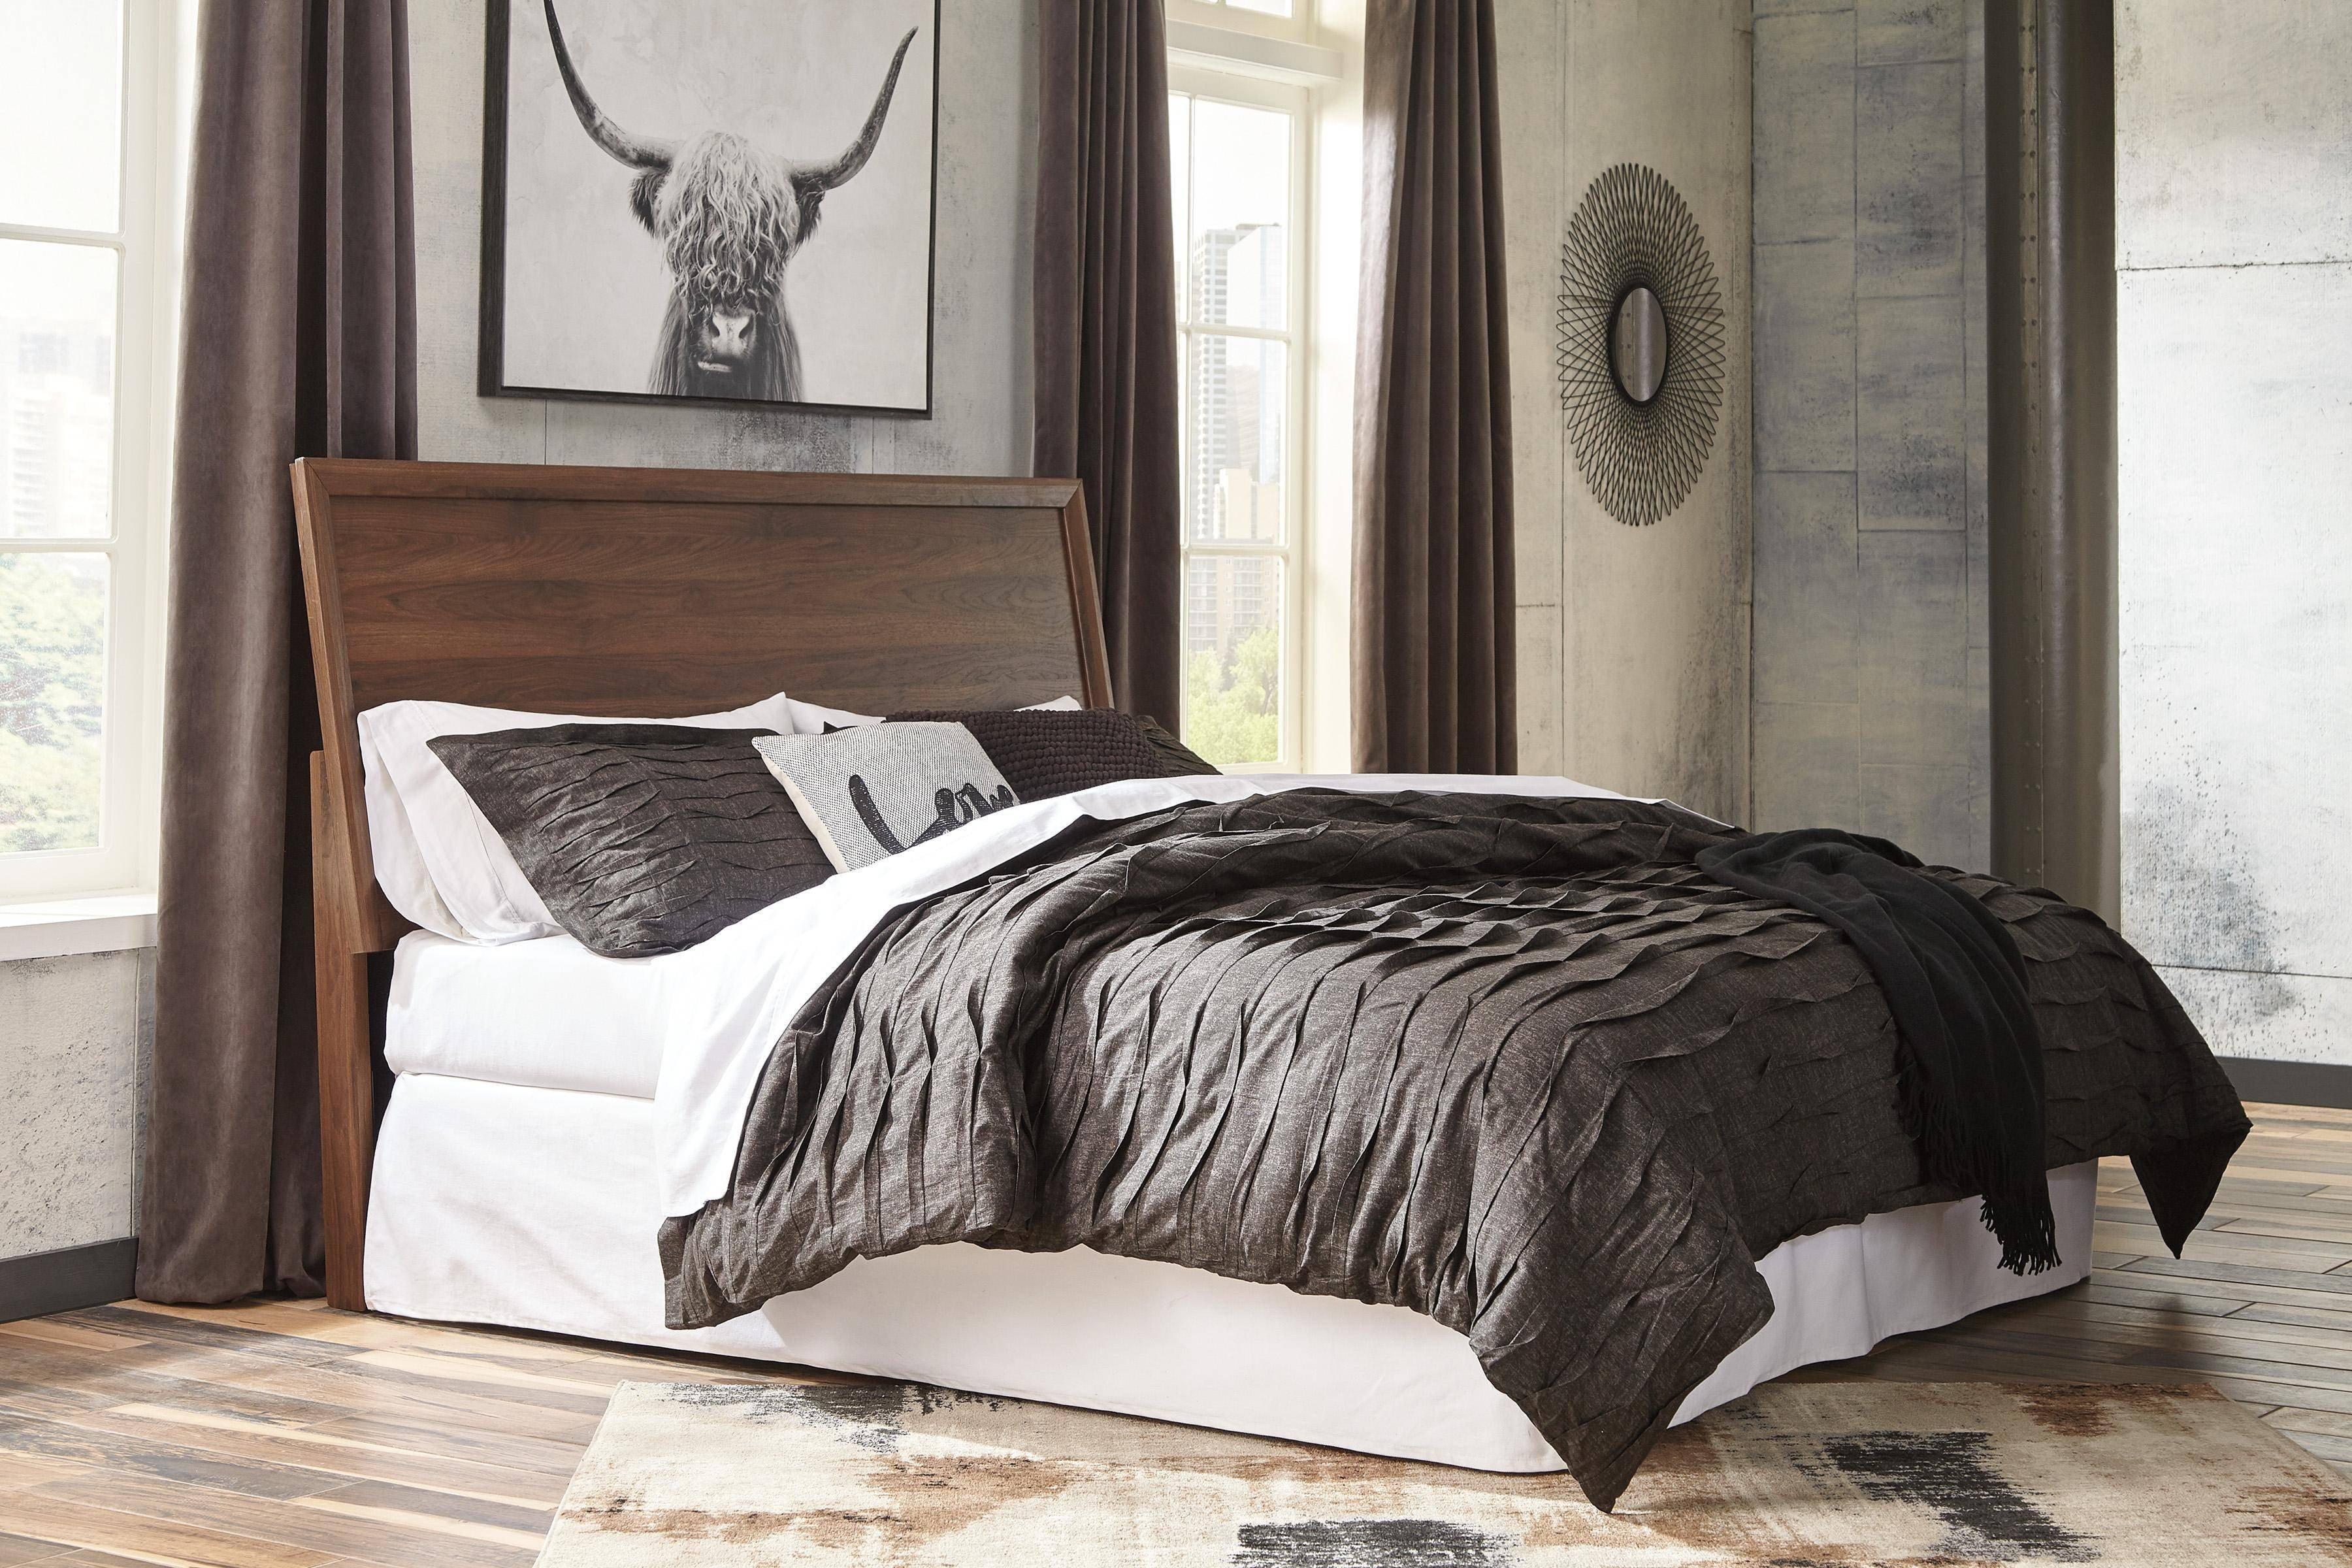 Ashley Furniture Bedroom Set Price Unique ashley Daneston B292 King Size Panel Bedroom Set 6pcs In